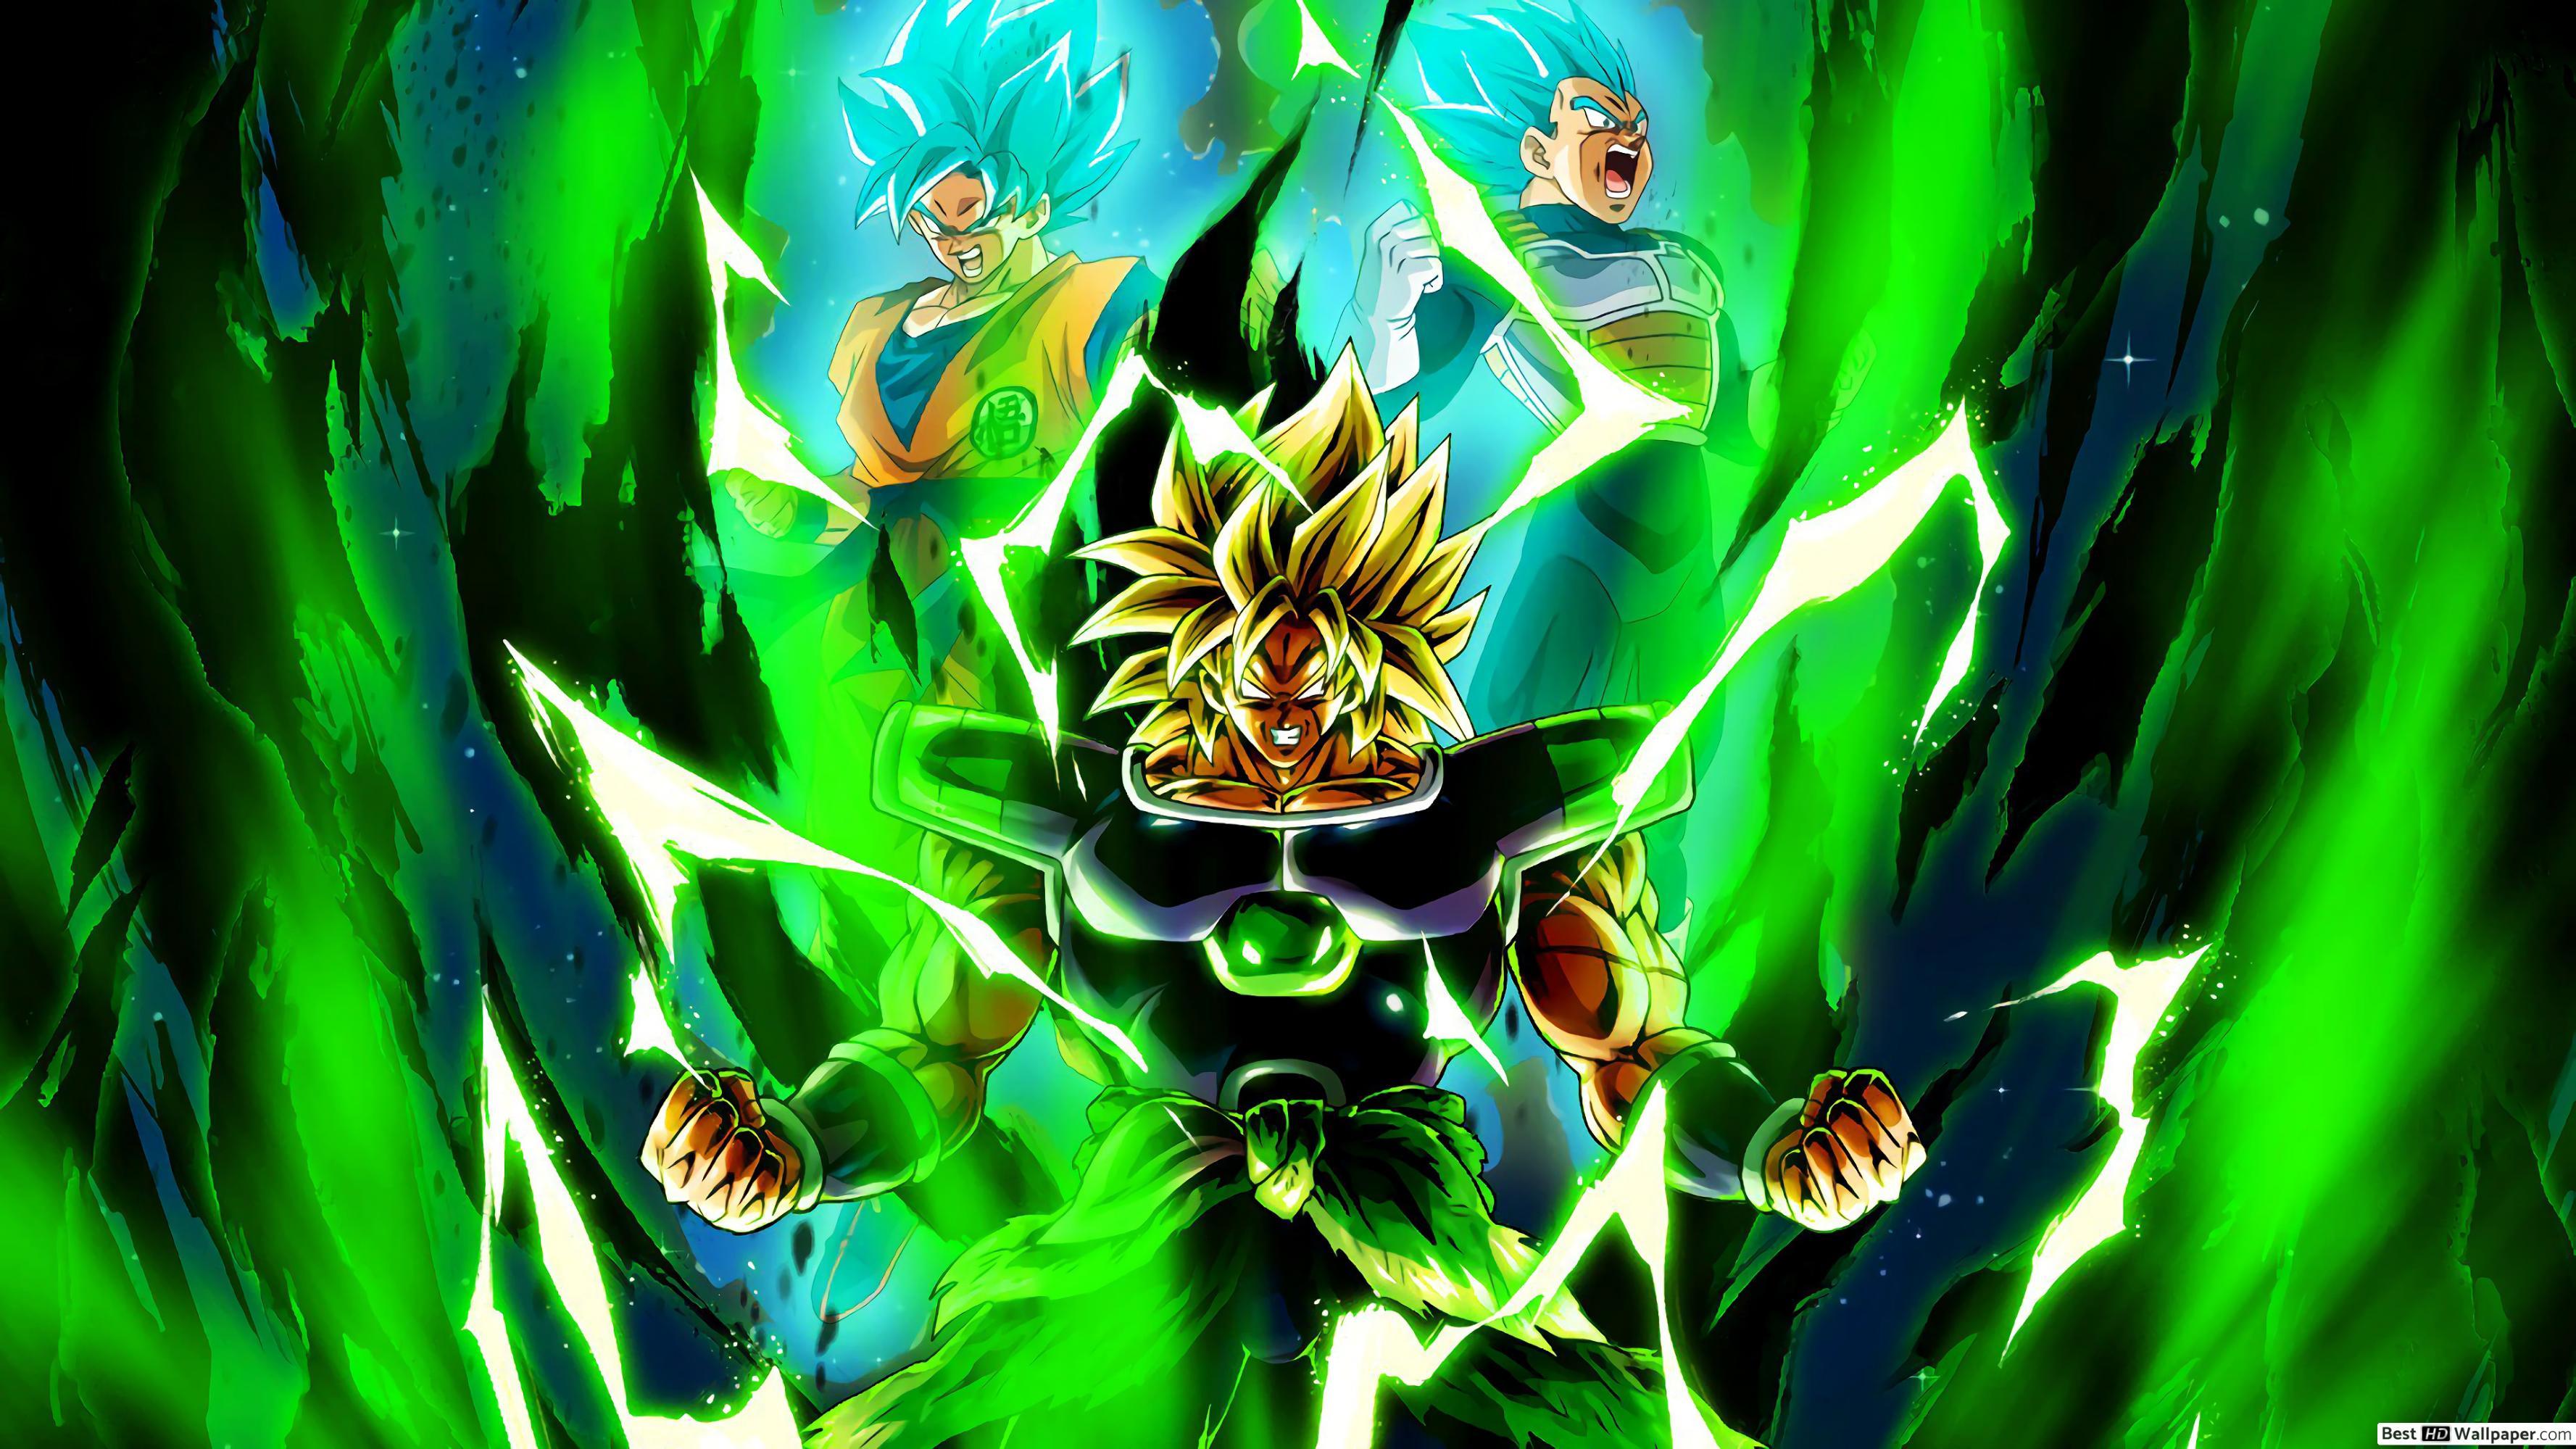 Super Saiyan Dragon Ball Super Broly 2498423 Hd Wallpaper Backgrounds Download